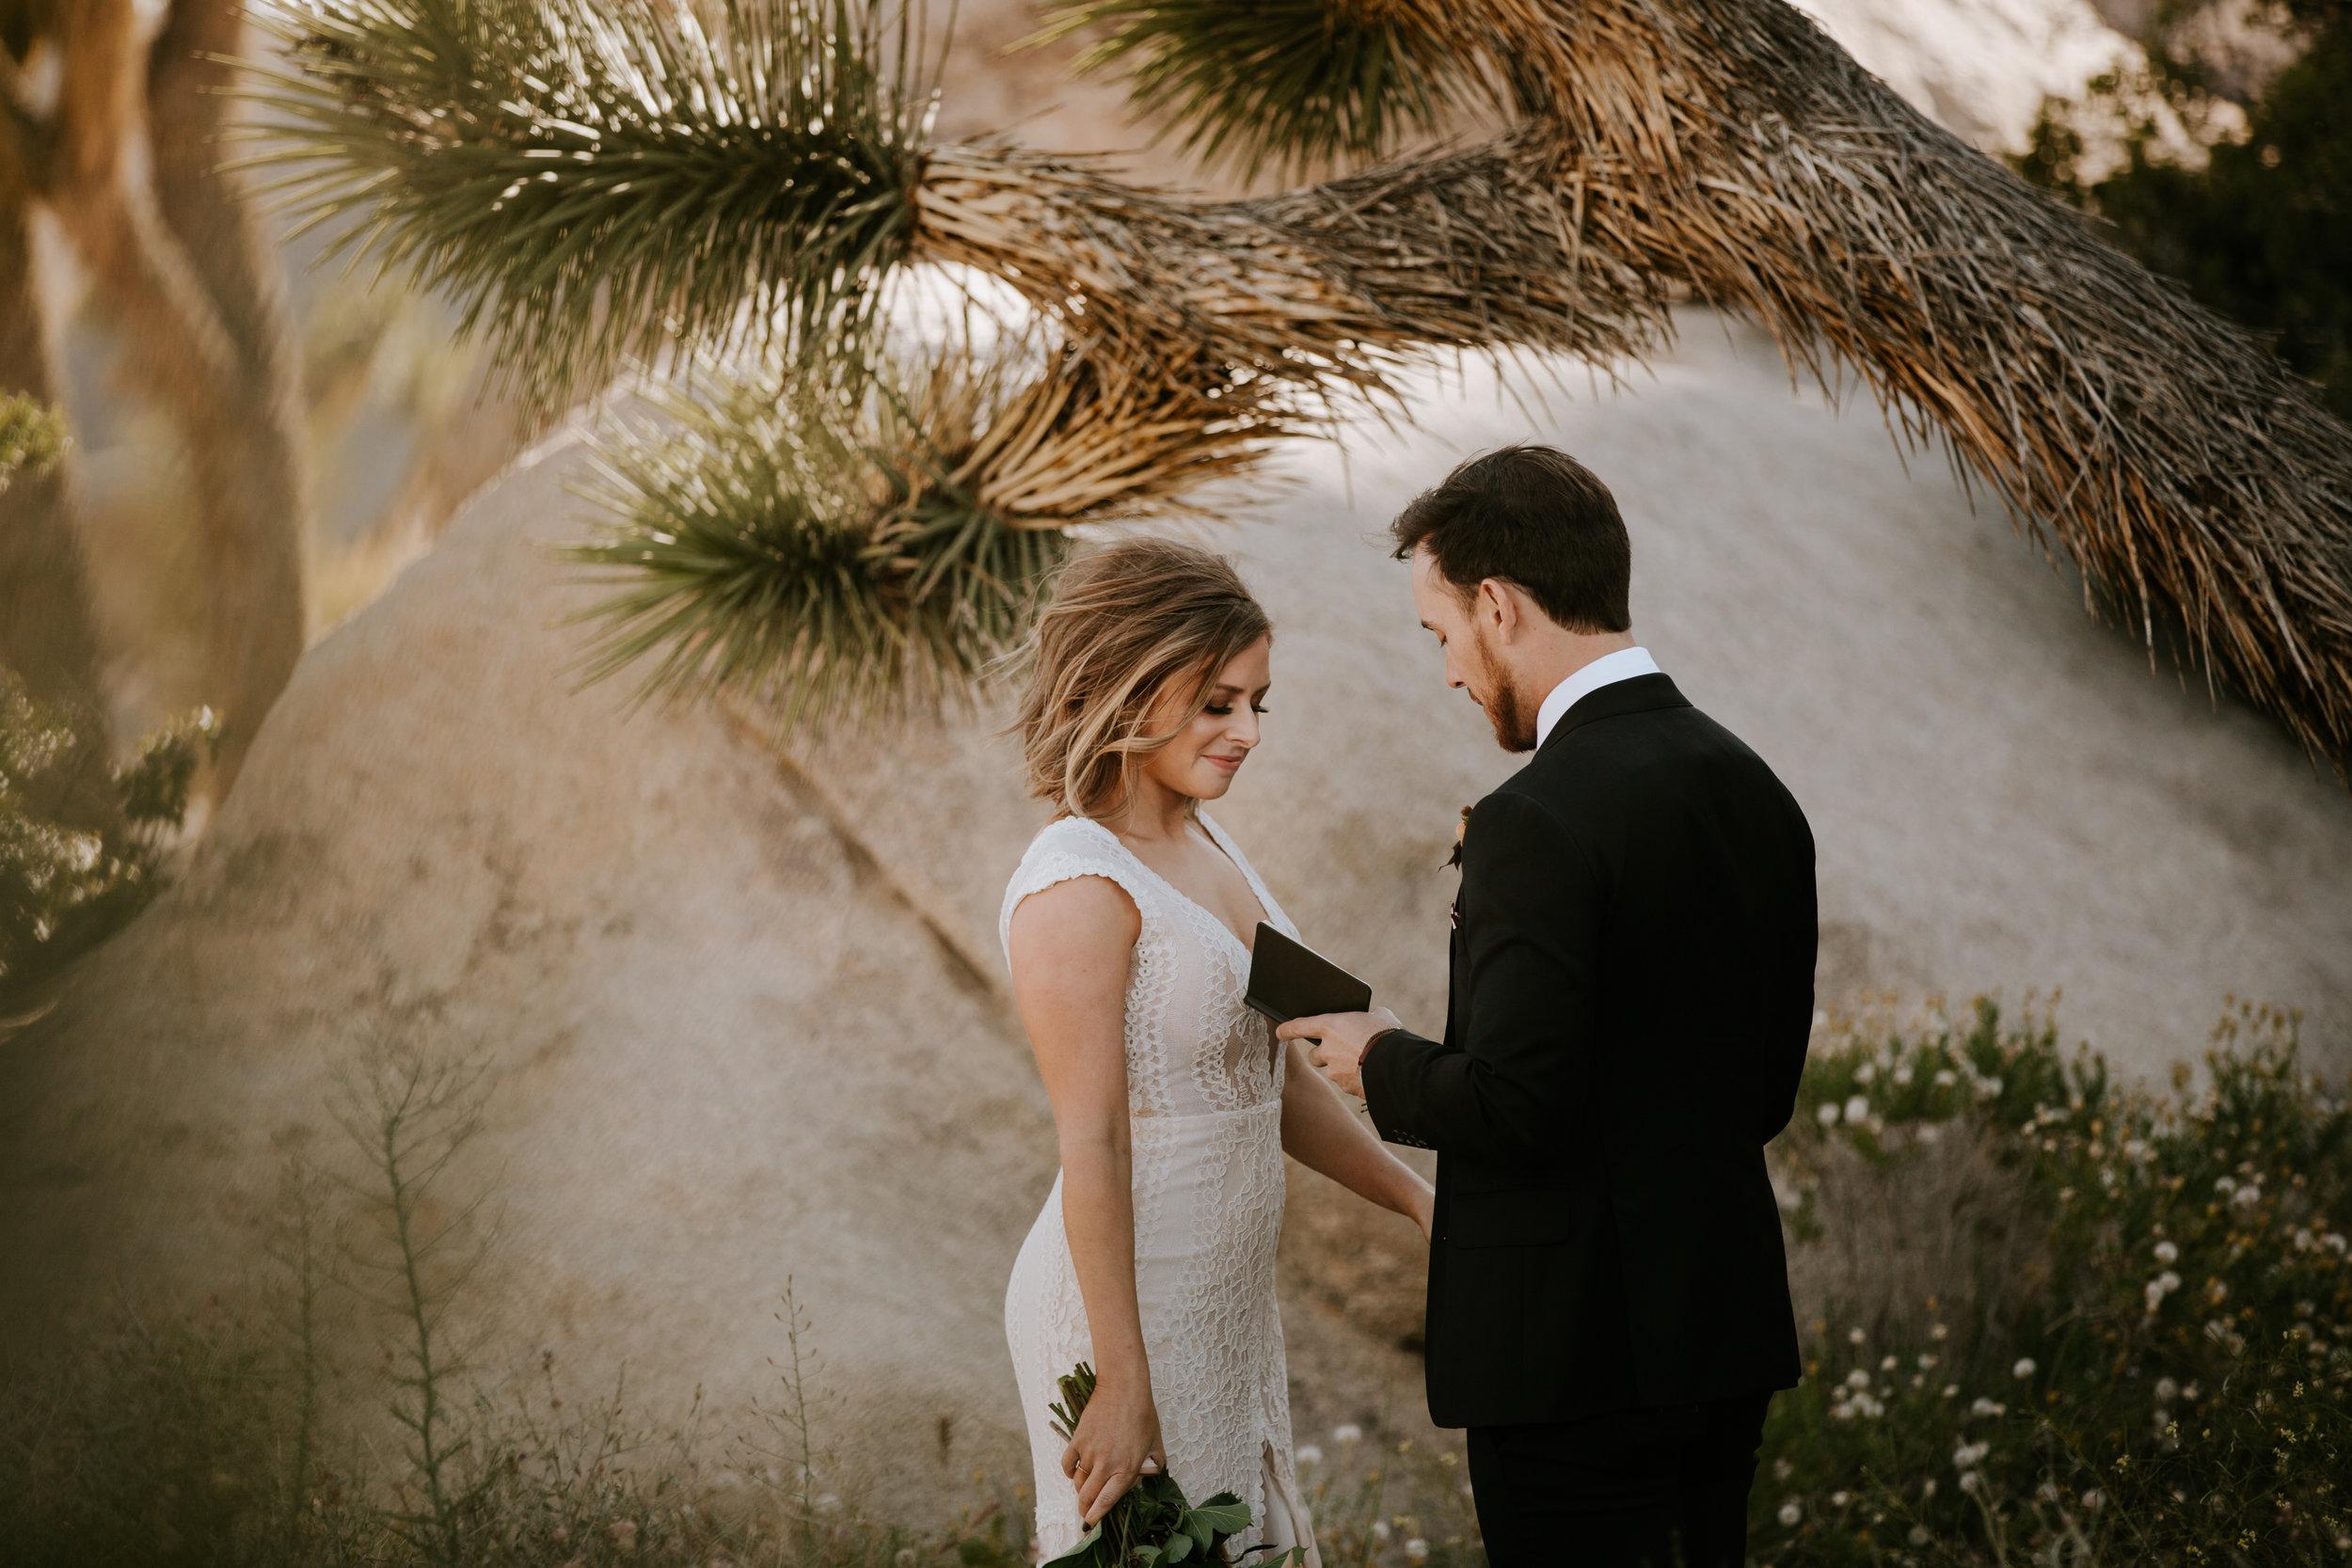 2019-05-26_Callie-Evan_Wedding_Joshua Tree_Paige Nelson_PREVIEWS HR-29.jpg